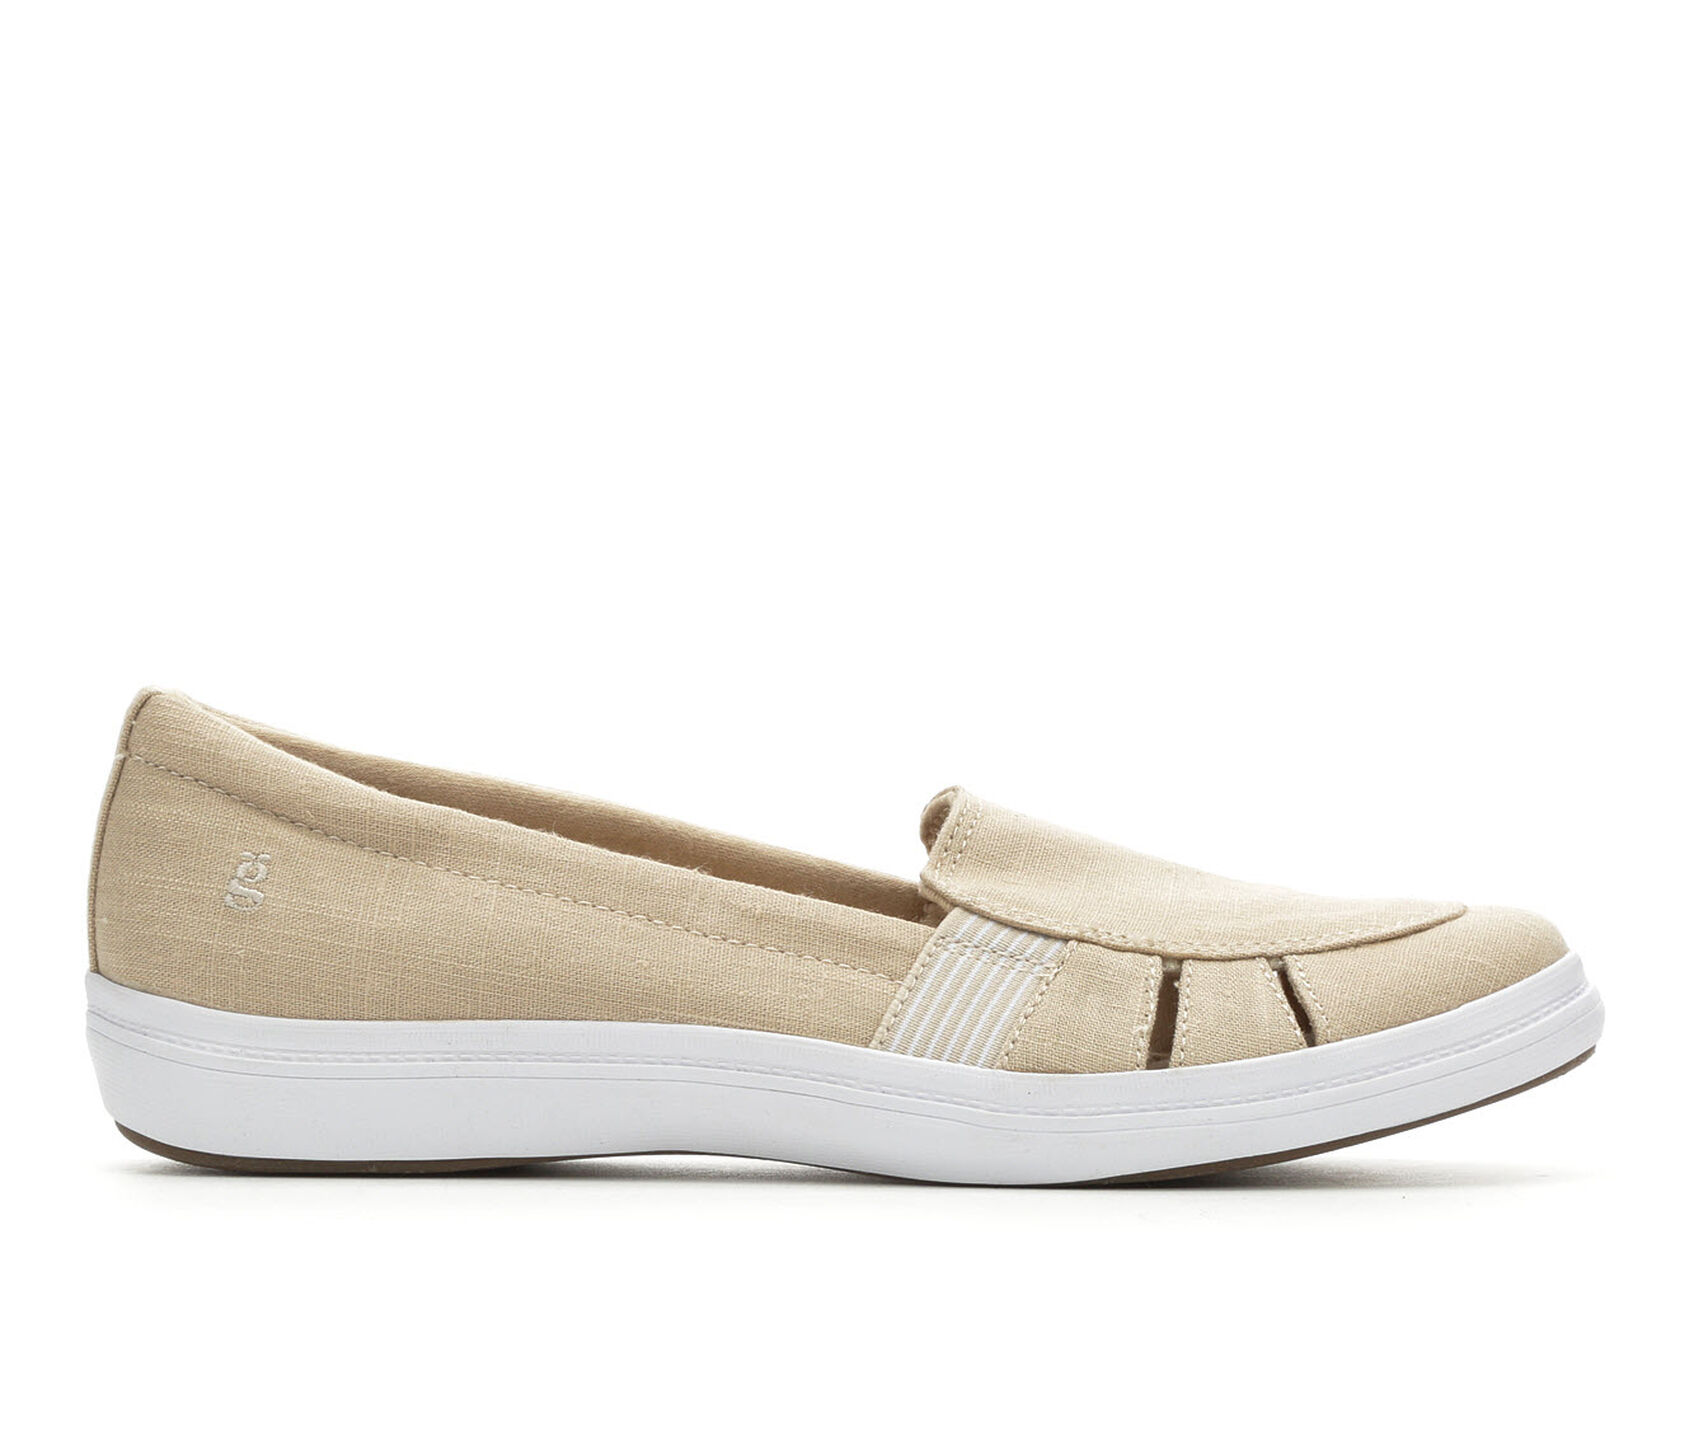 709edd03a082db Women s Grasshoppers Janis Fisherman Shoes